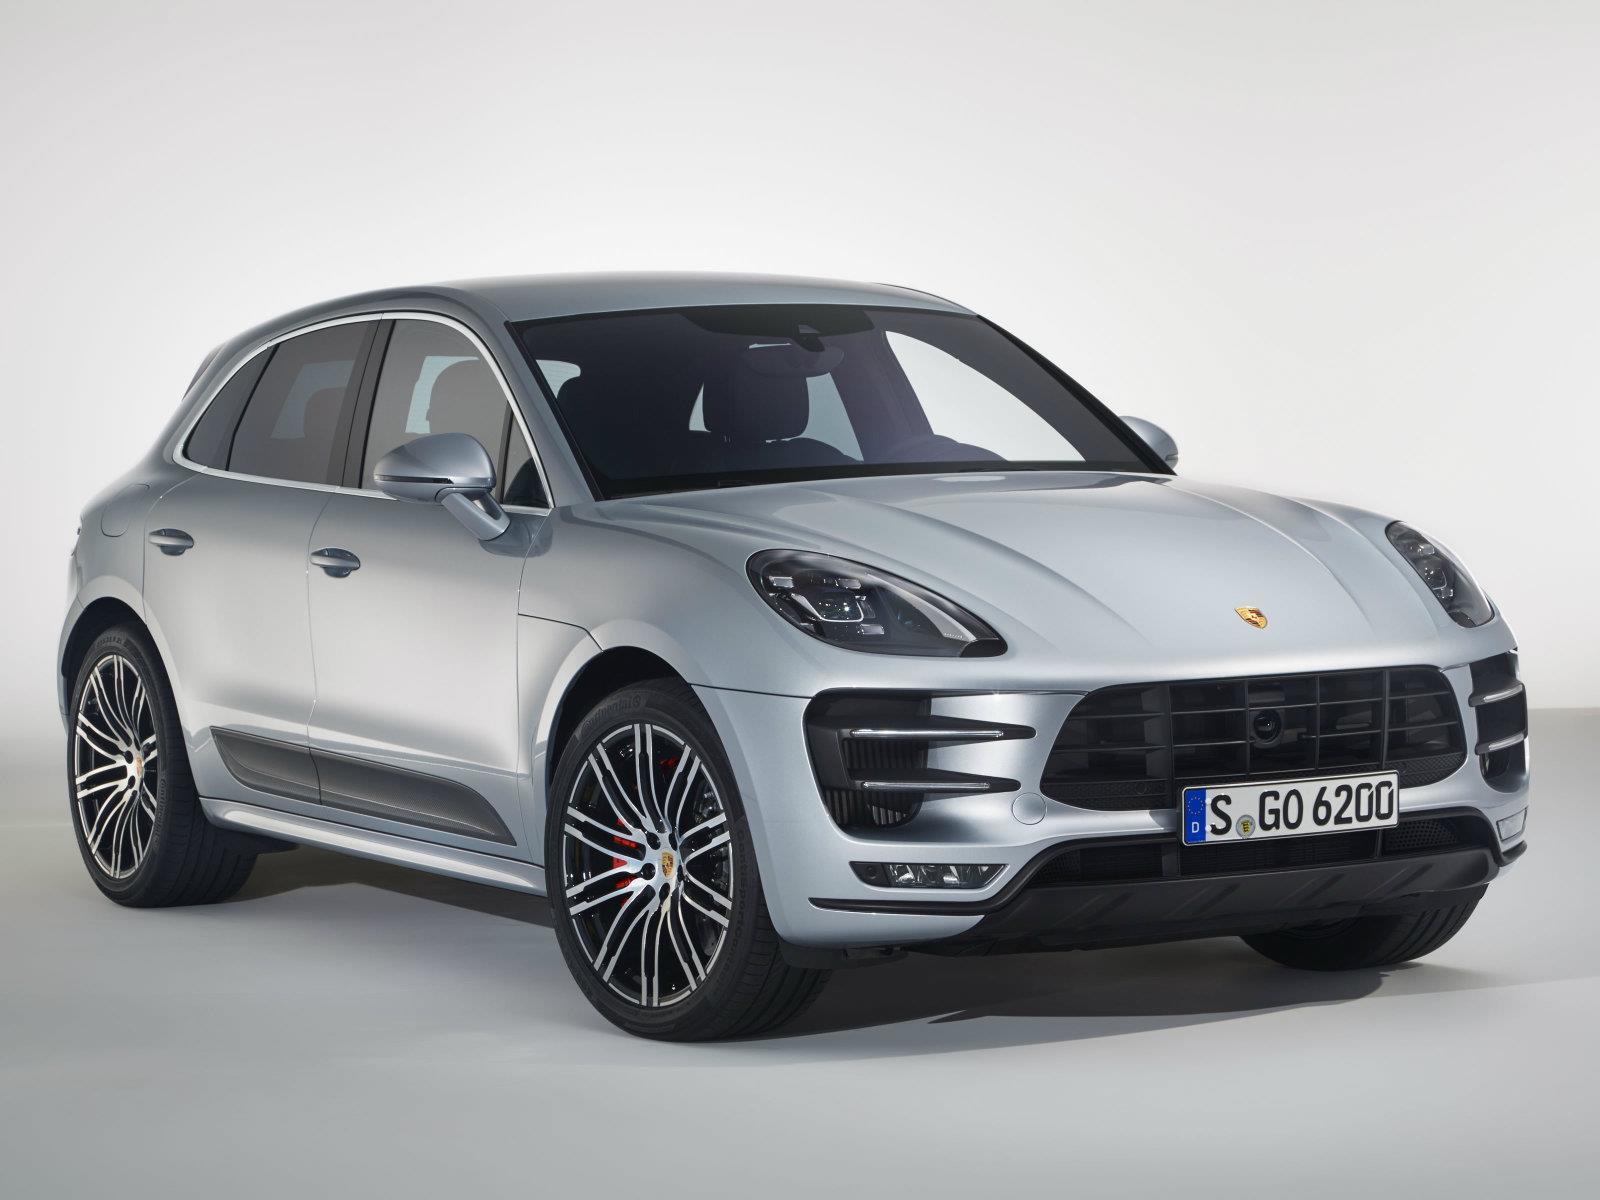 Porsche Macan Turbo con Performance Package, aún más deportiva